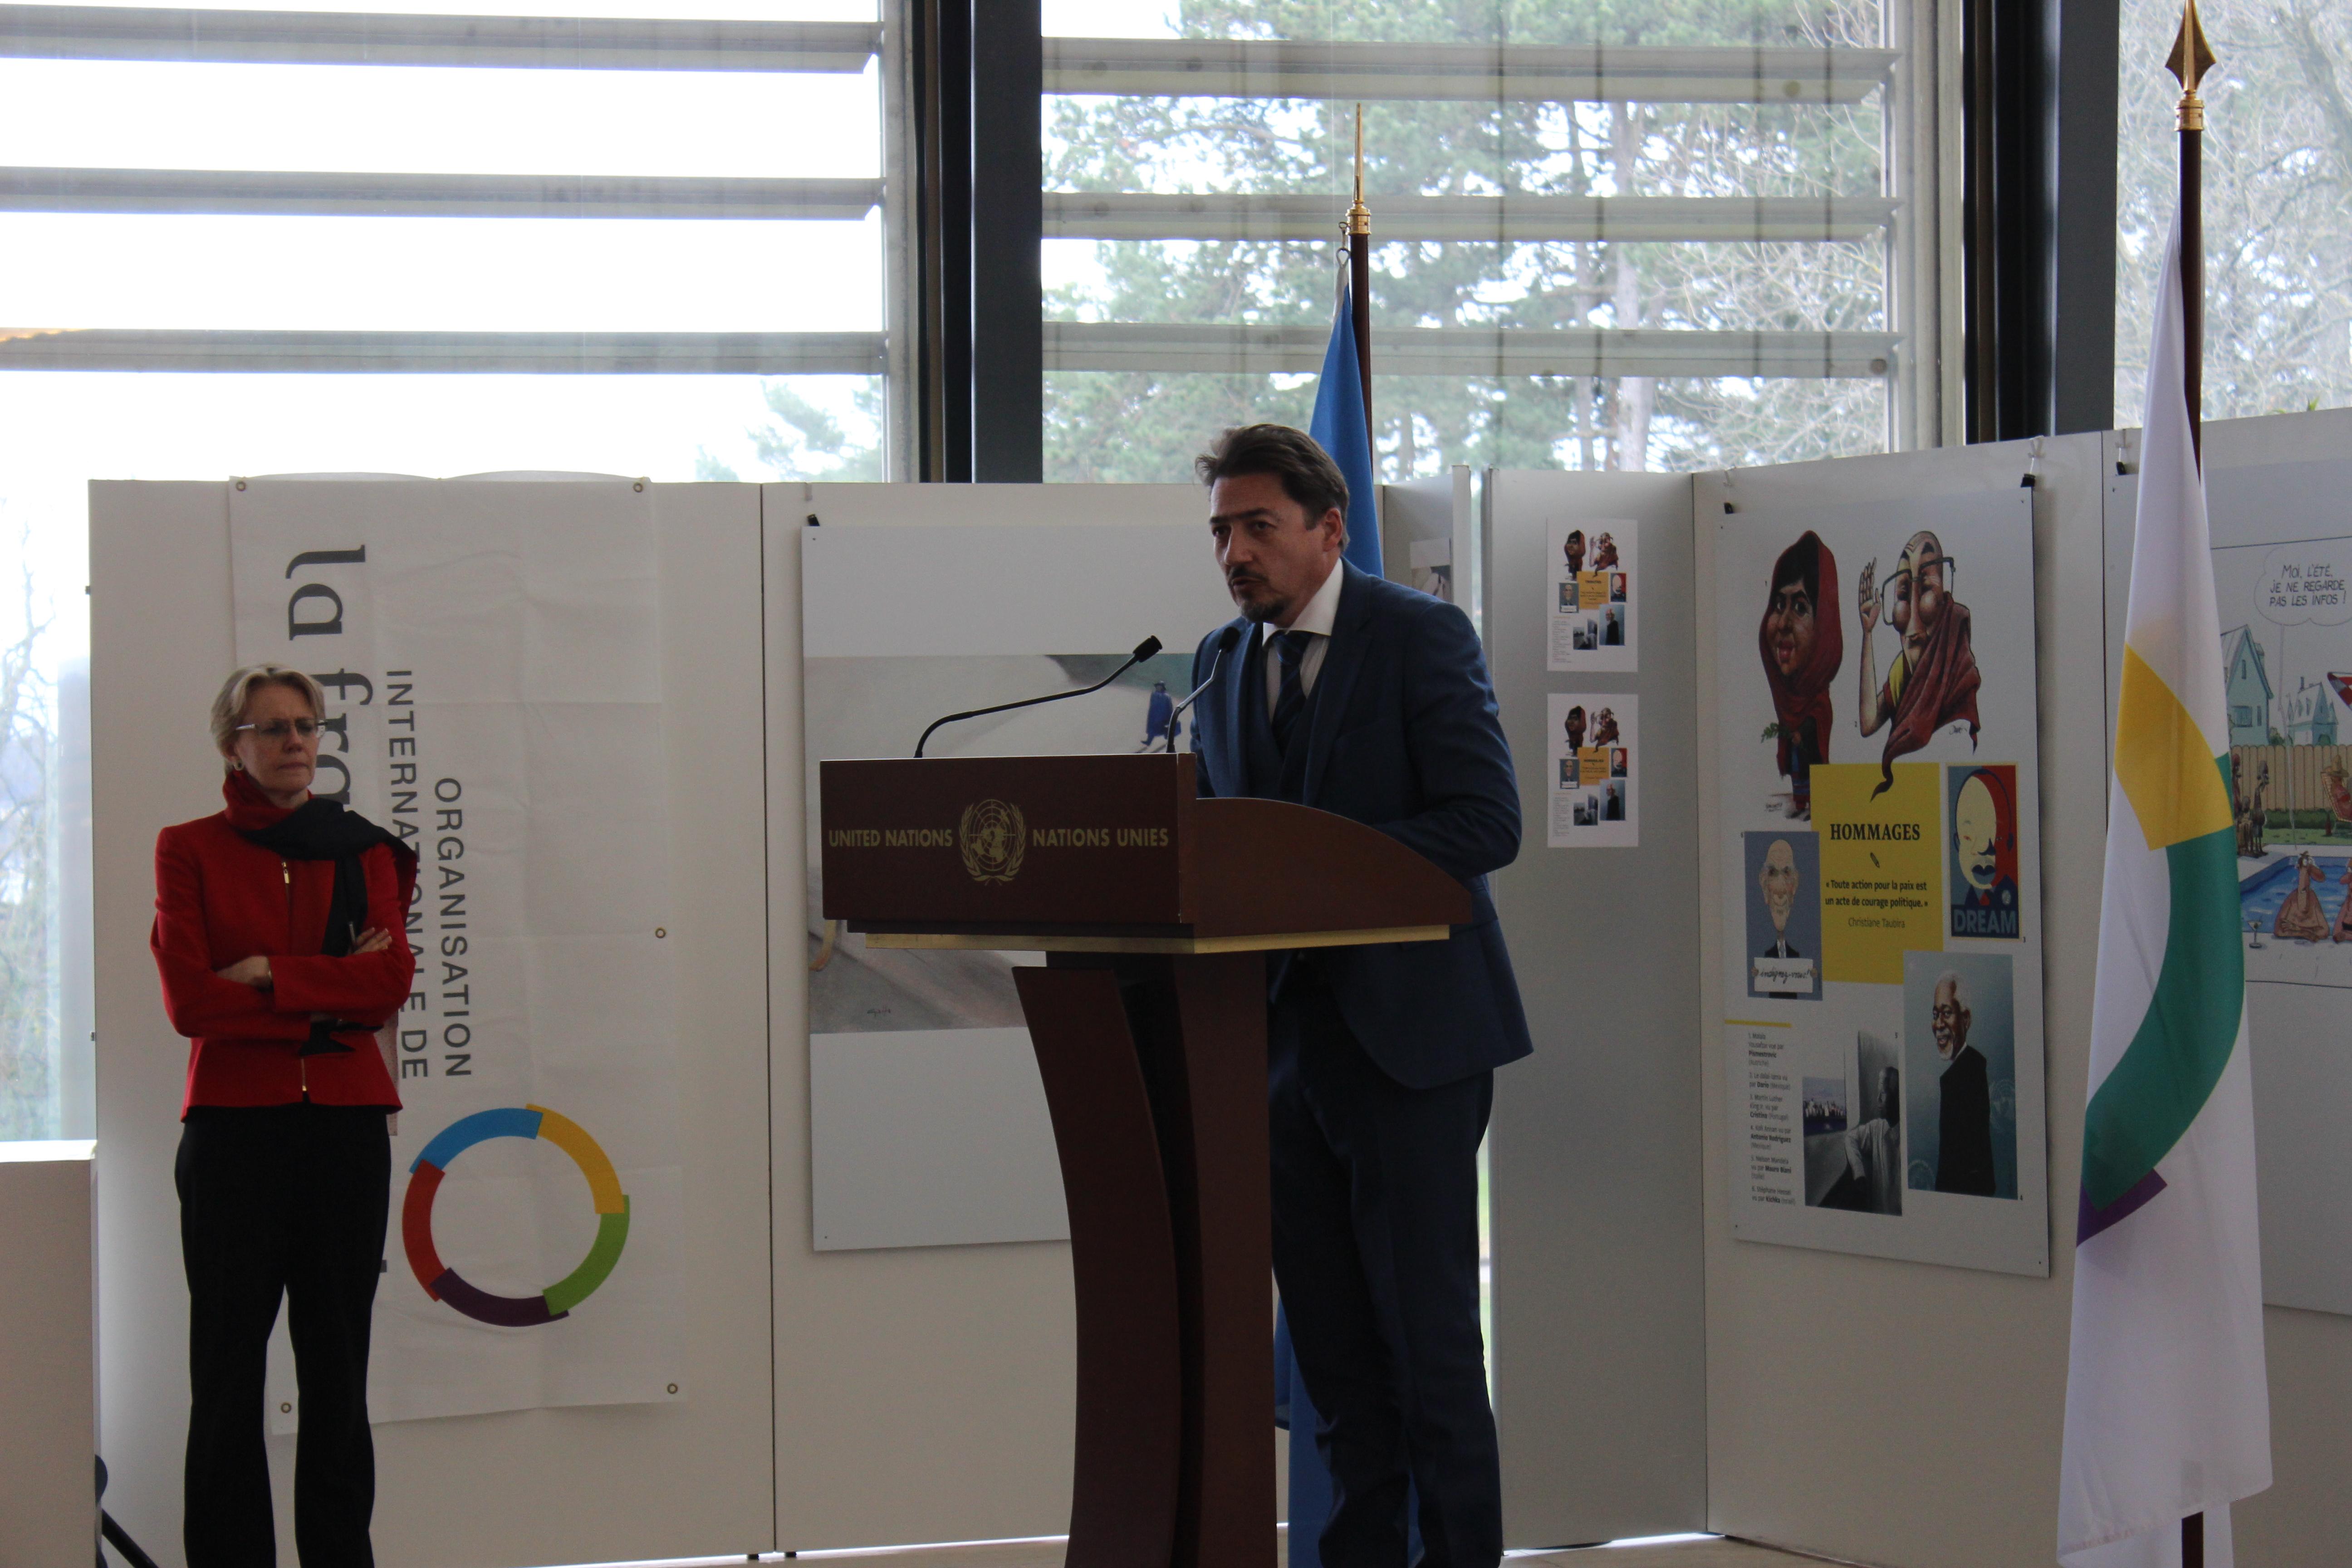 Preview of the exhibition «Human rights – still some way to go?»-photo: UN Geneva : Programme des activités culturelles